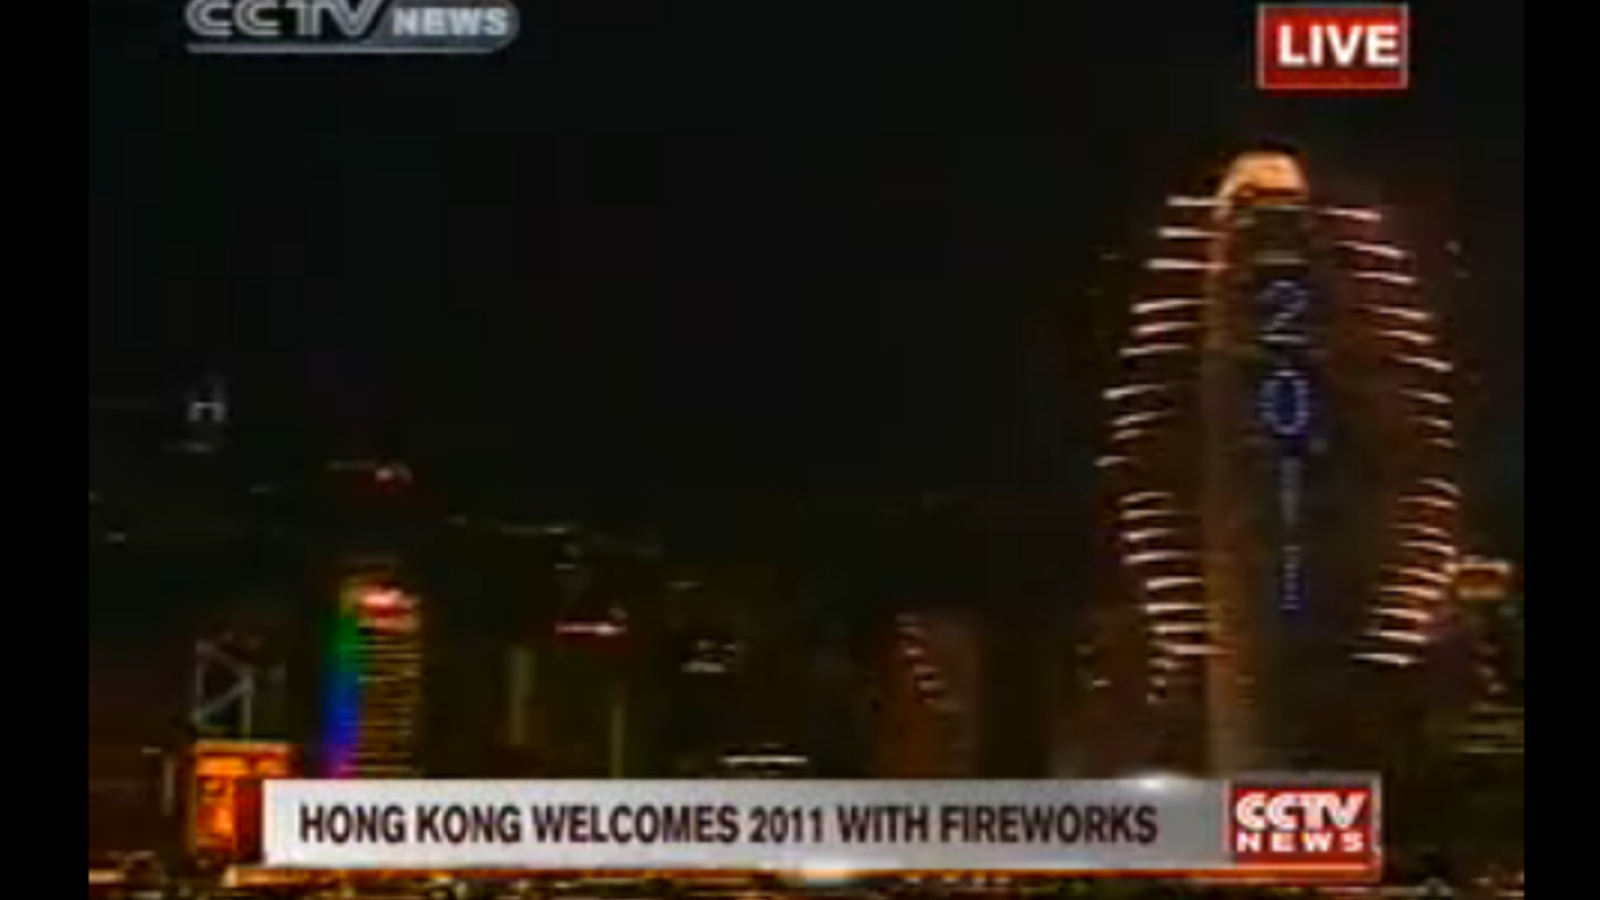 Ja és 2011 (a Hong Kong)